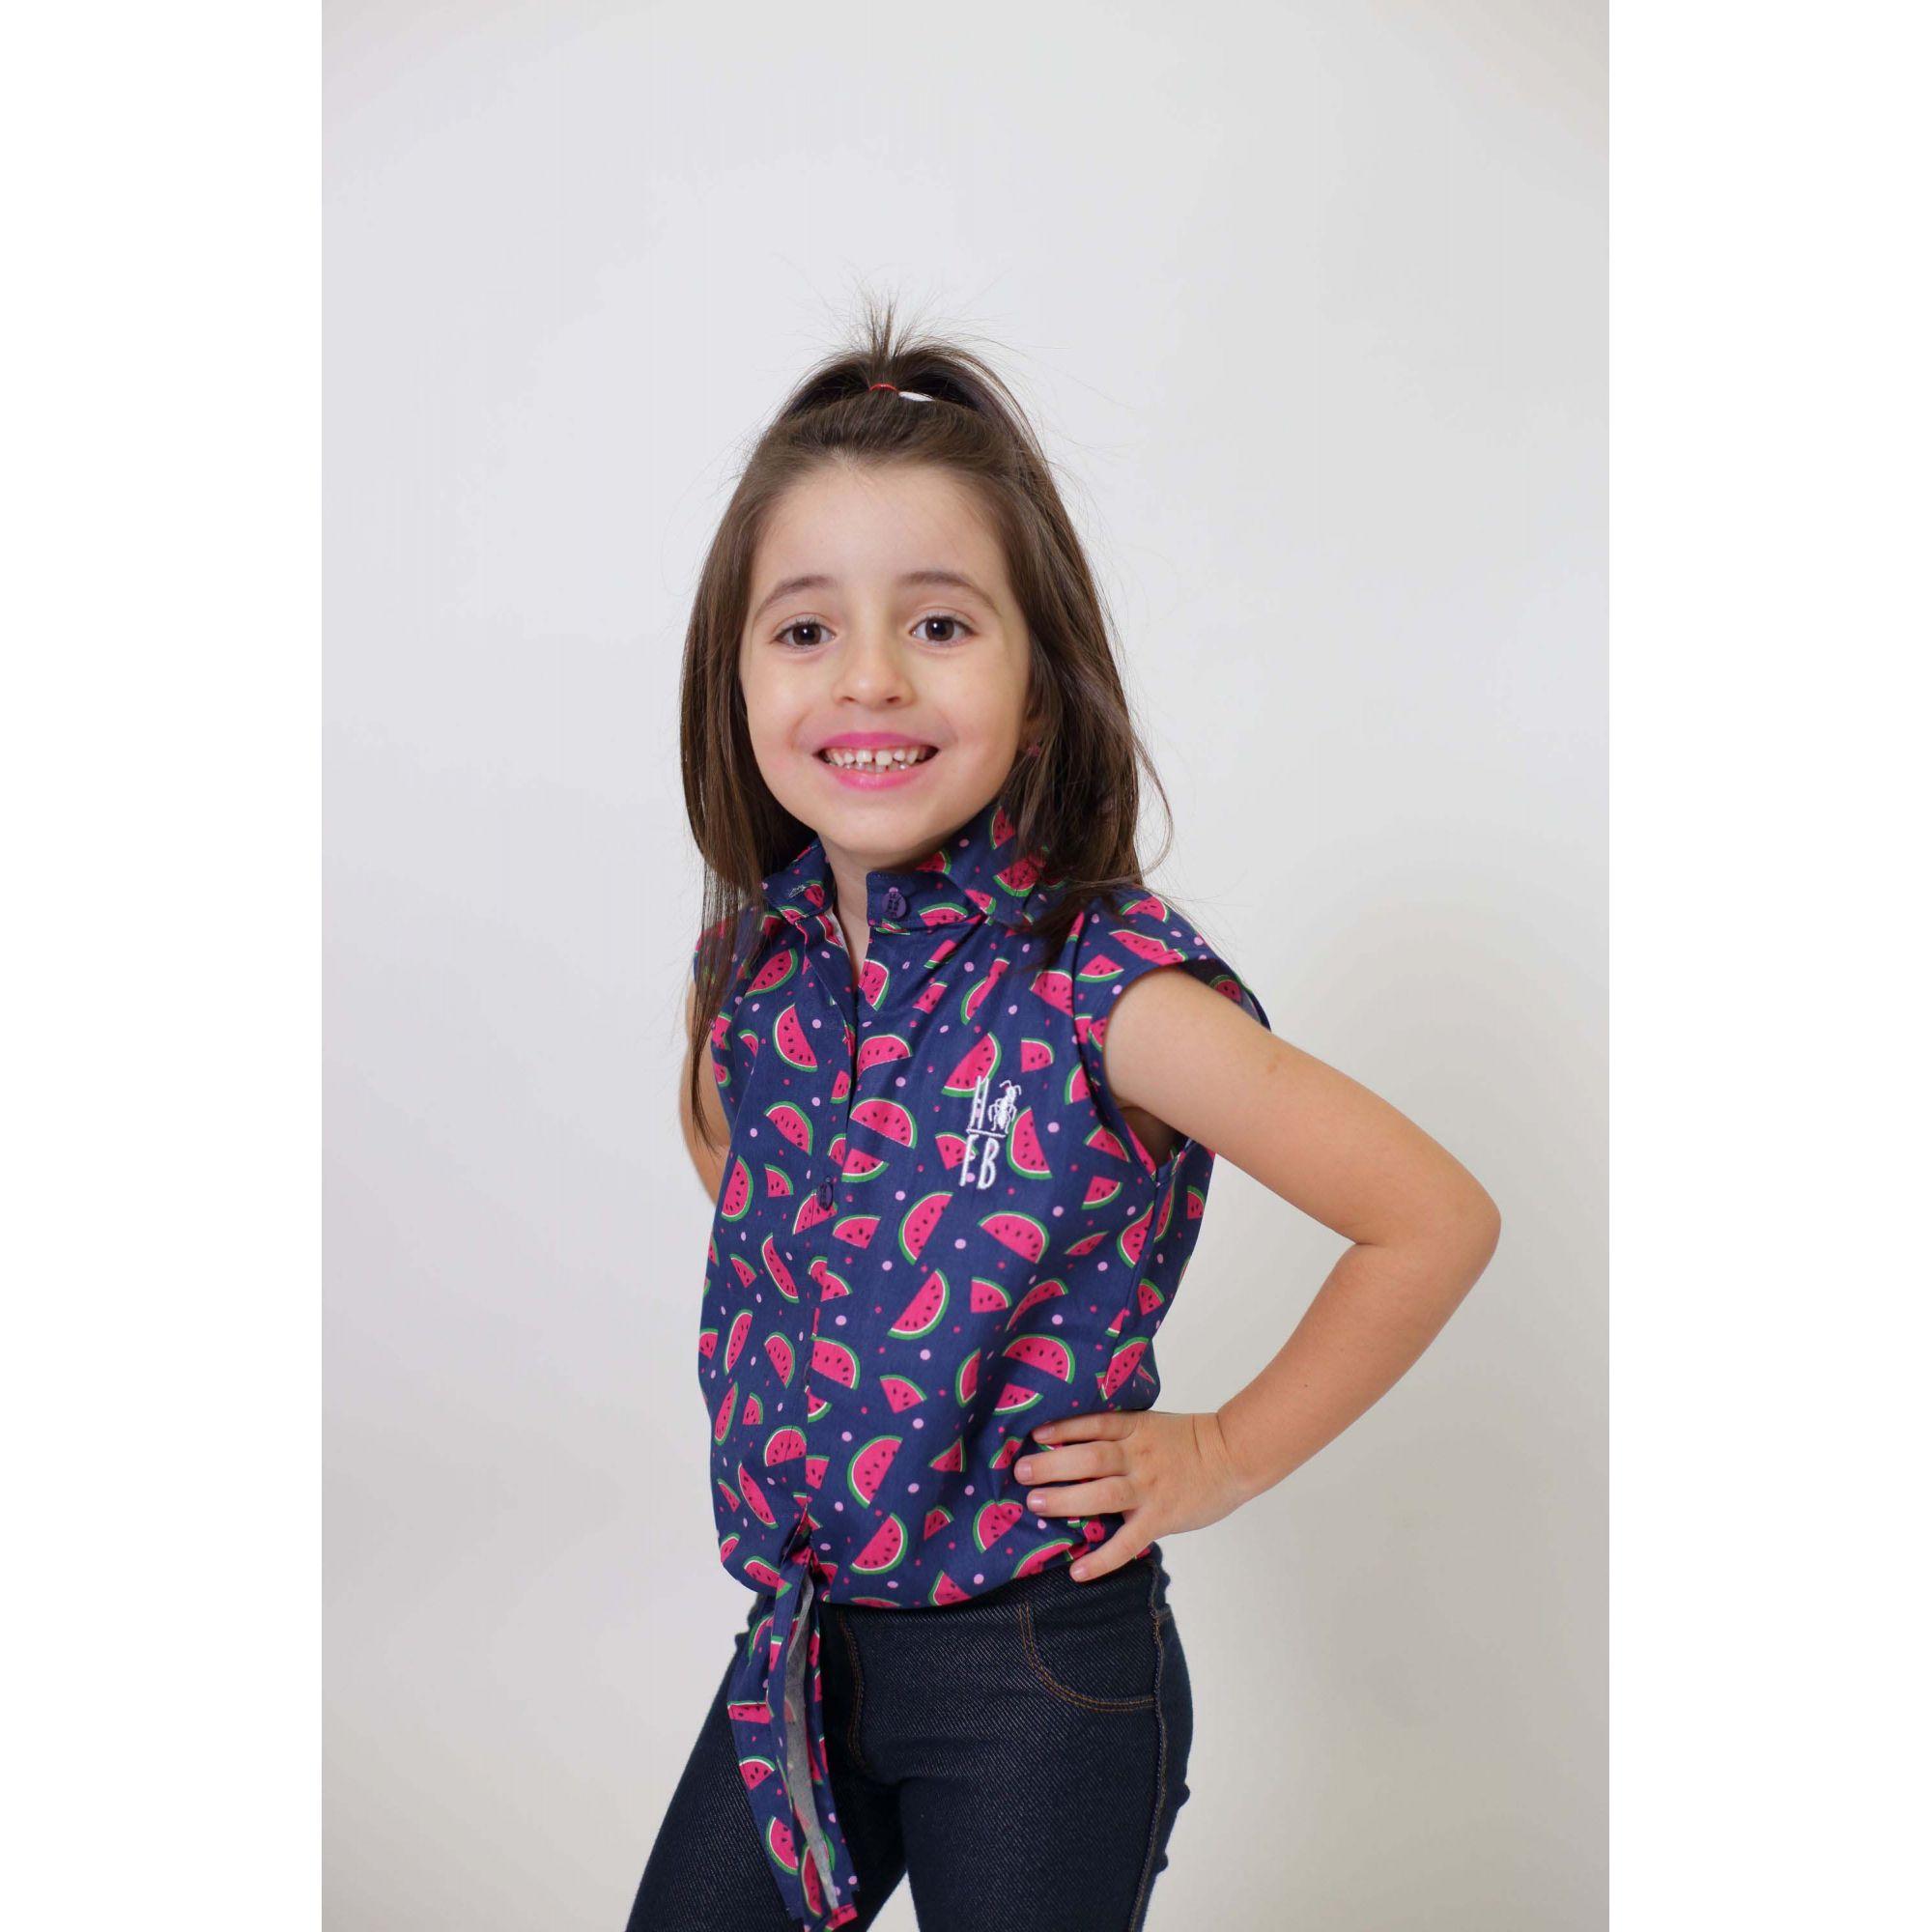 Camisa Social Sem Manga Melancia Feminina Infantil  - Heitor Fashion Brazil